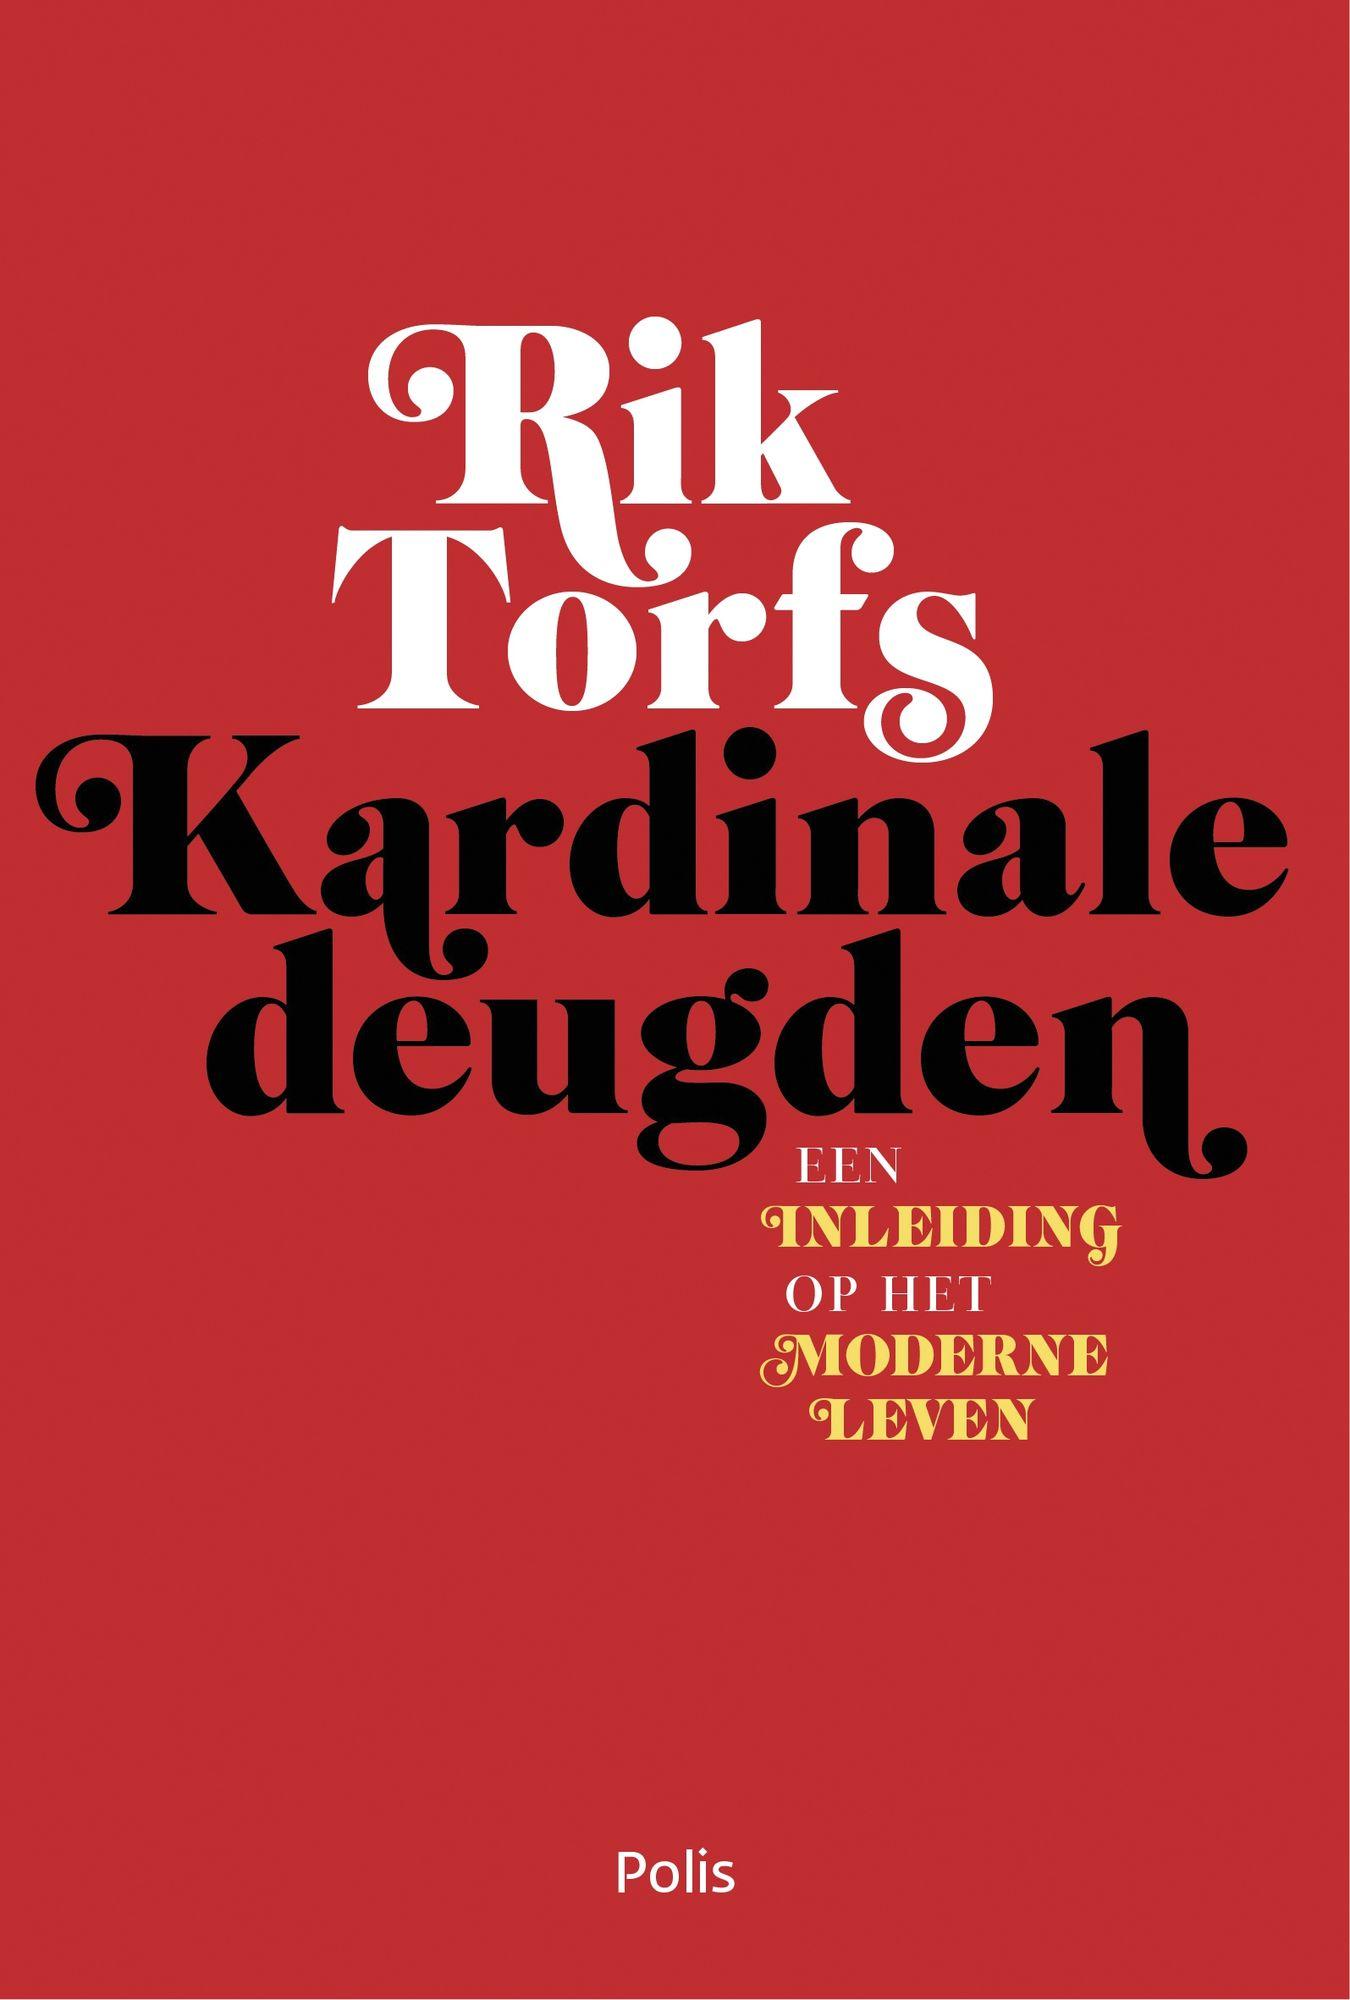 Rik Torfs - Kardinale deugden